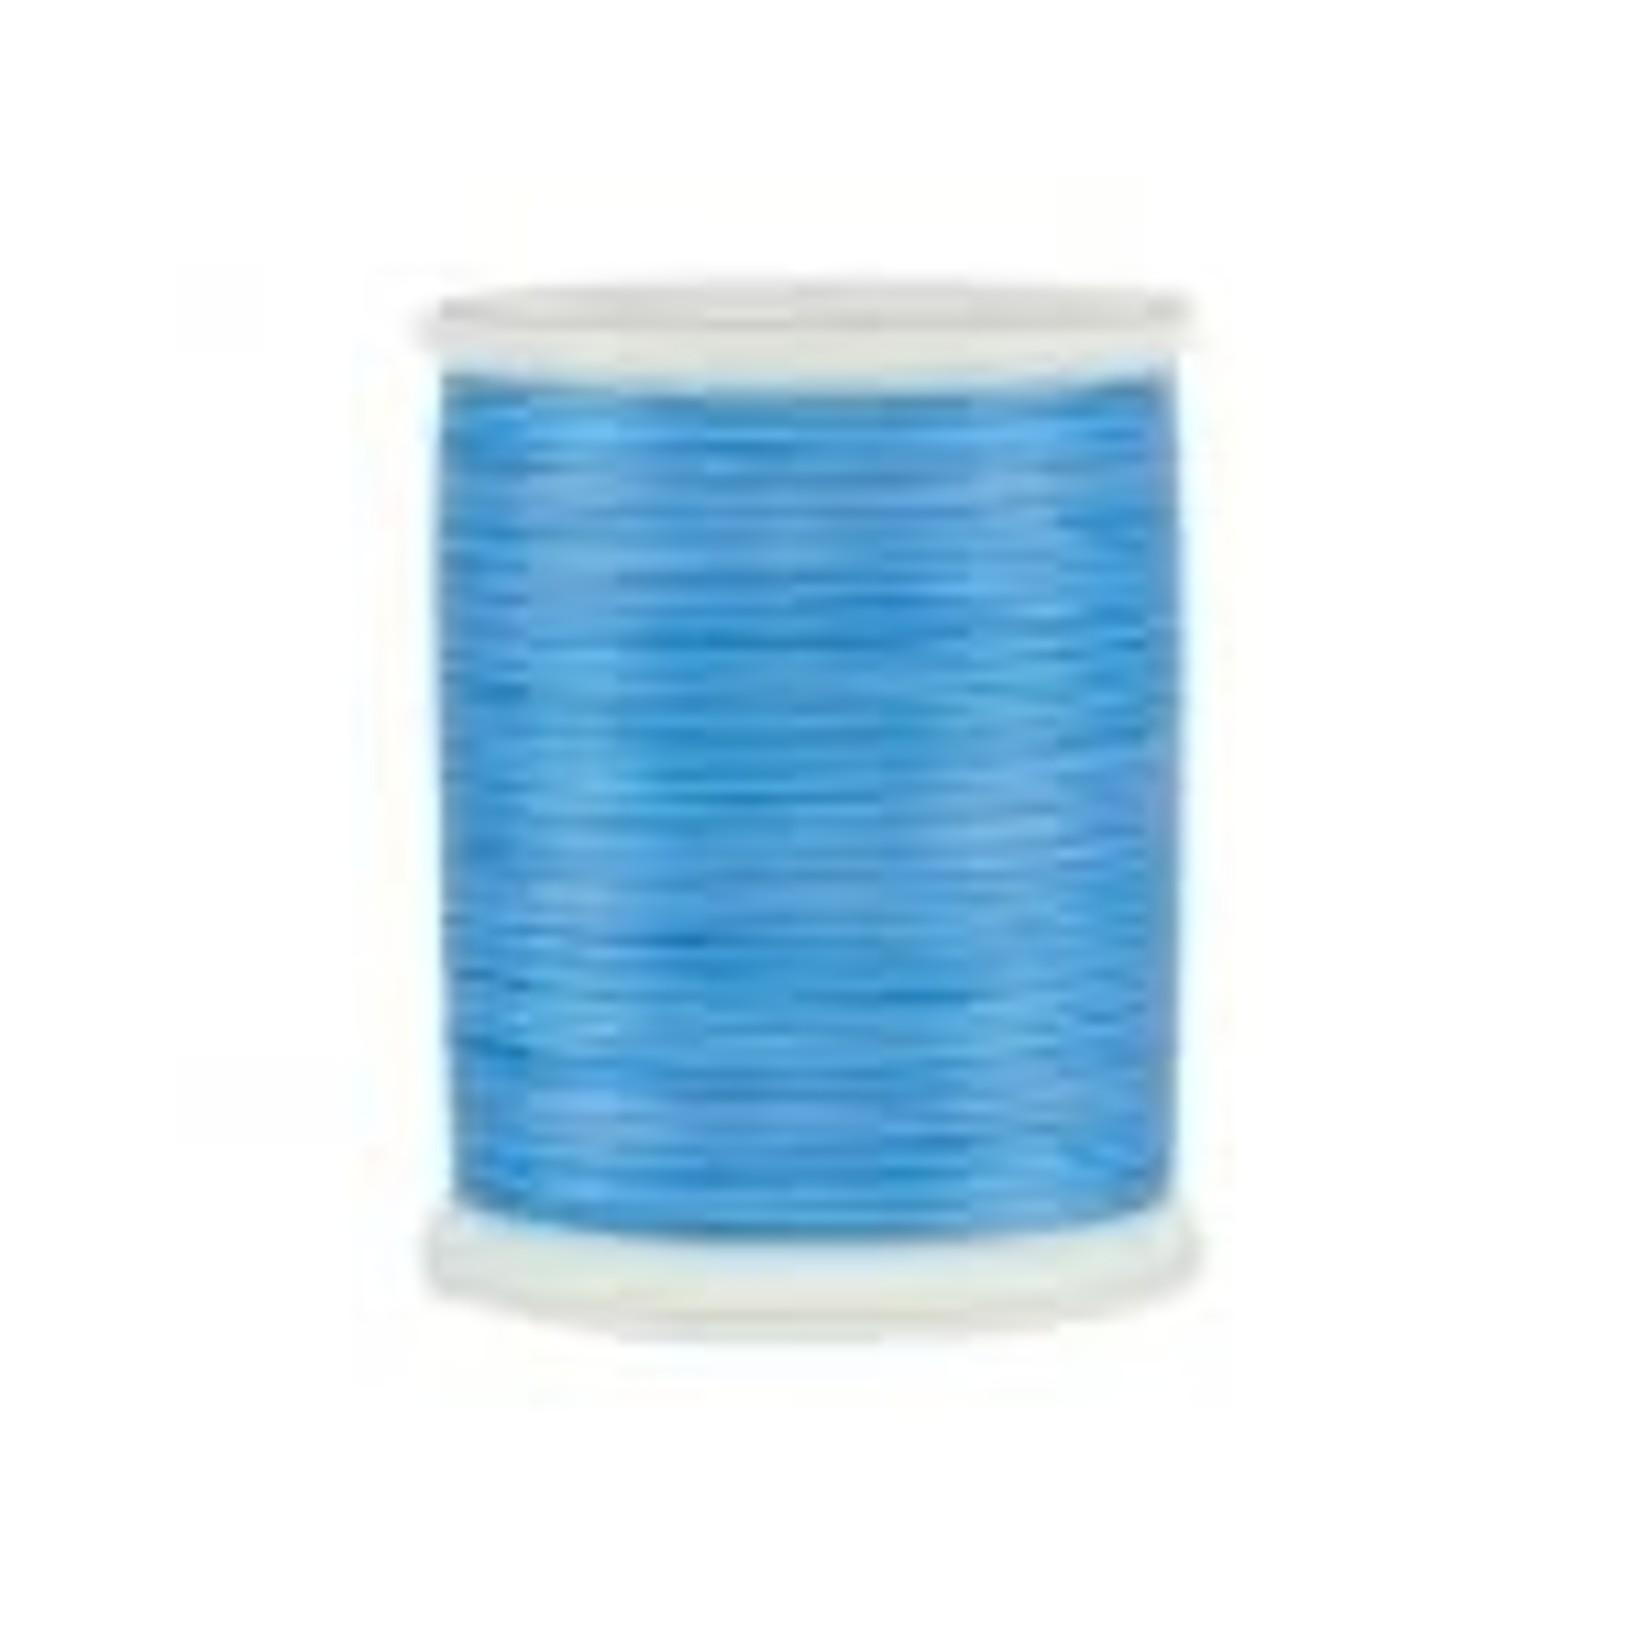 Superior Threads King Tut - #40 - 457 m - 0907 Aswan